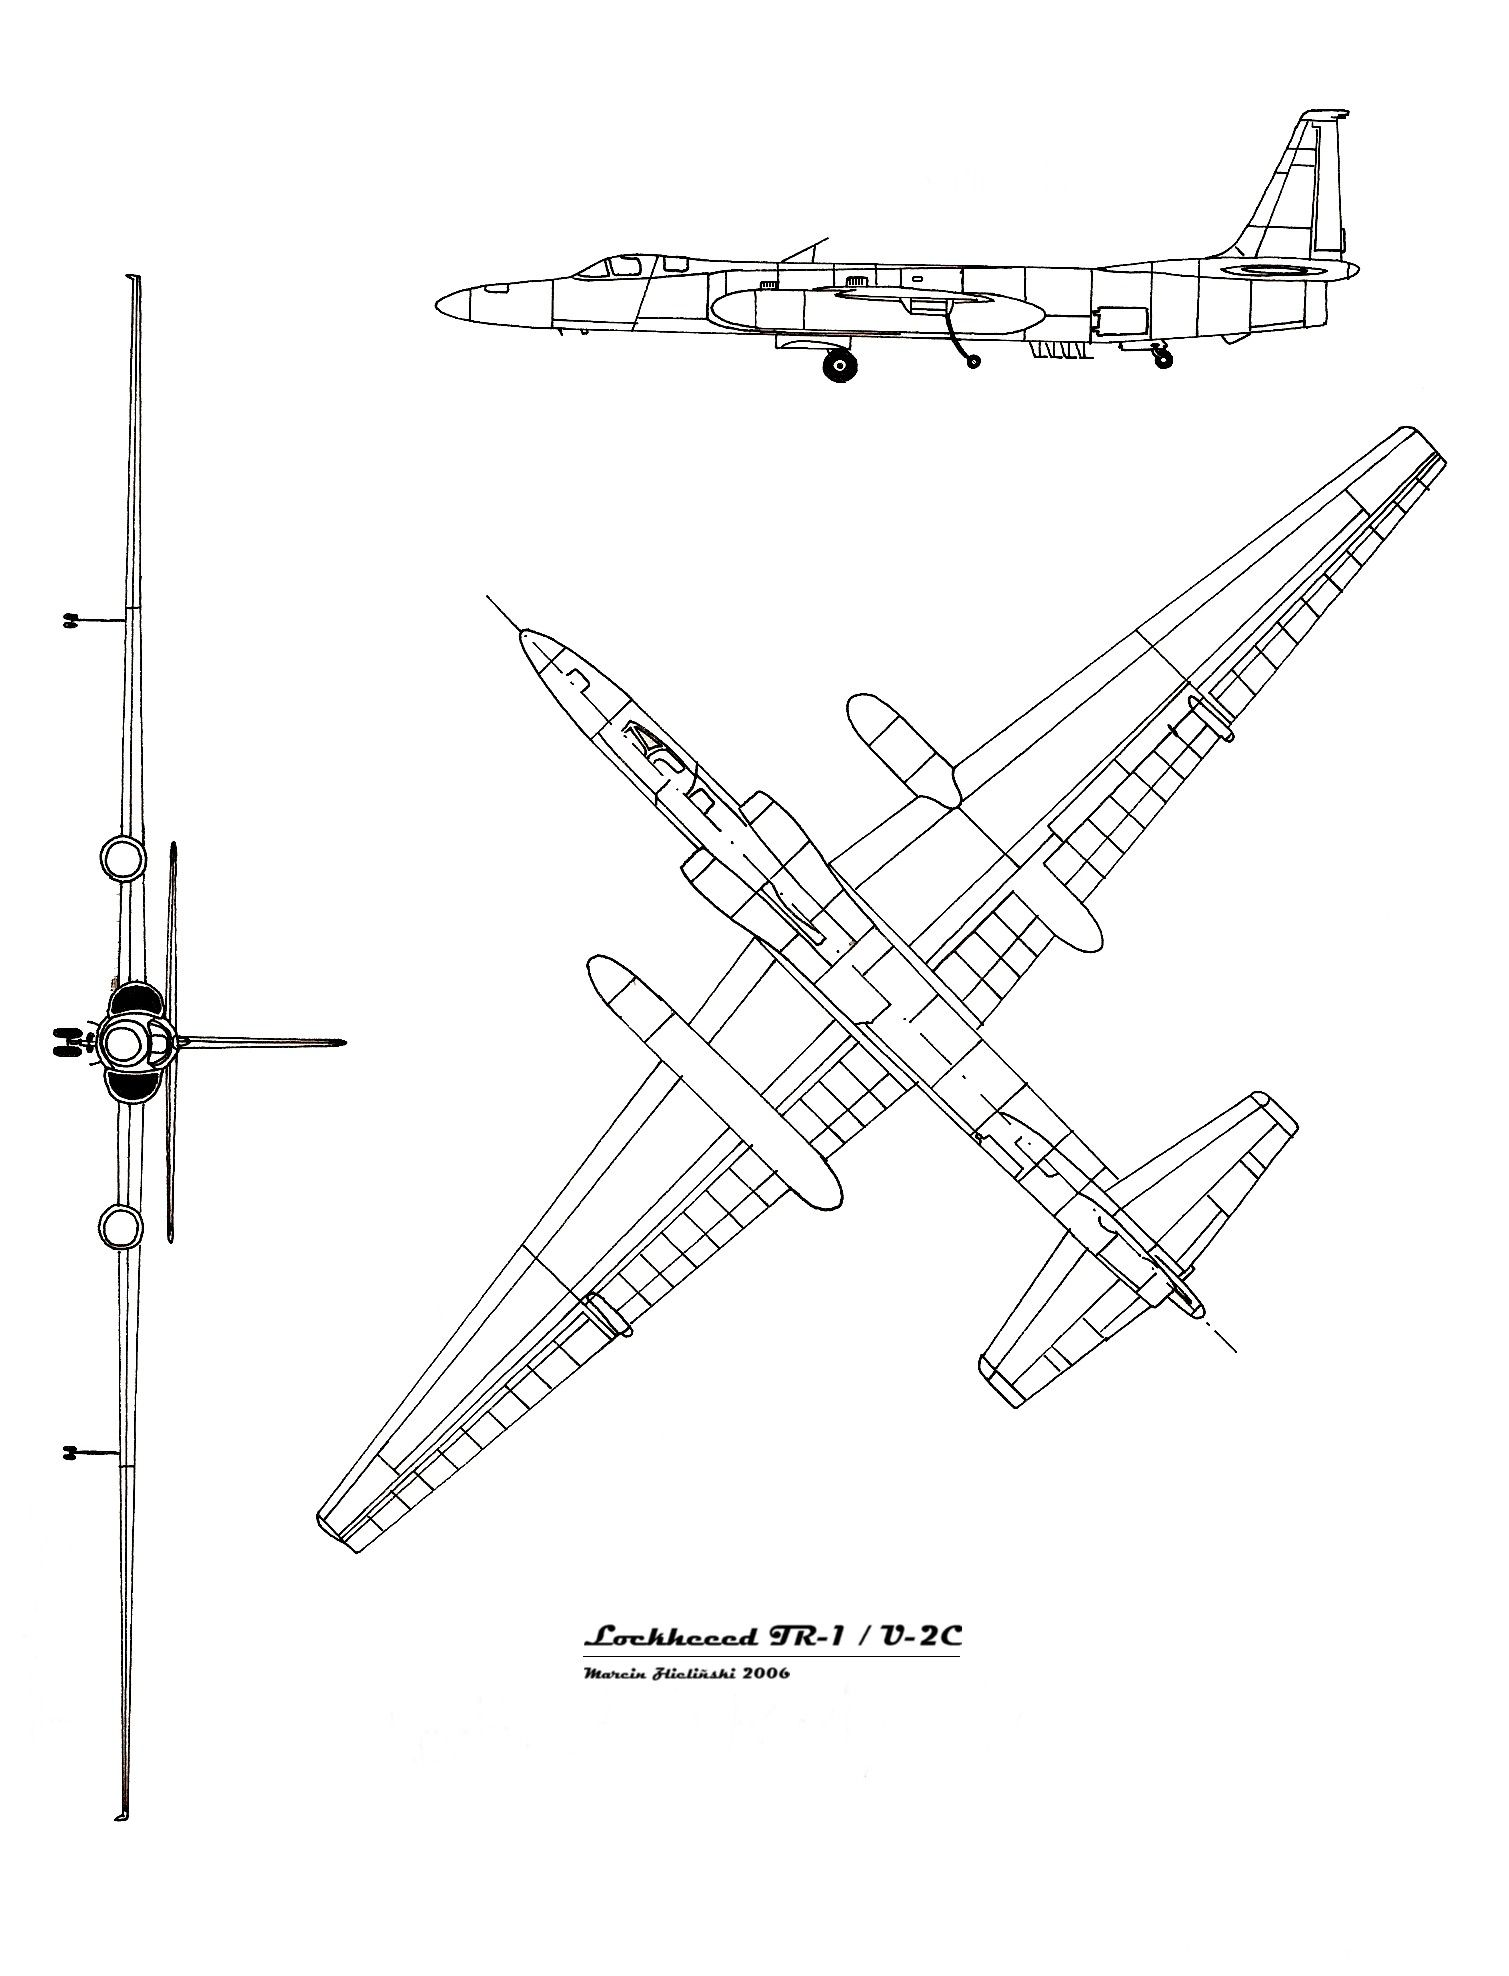 Pin By Yves Lessard On U 2 Spy Plane